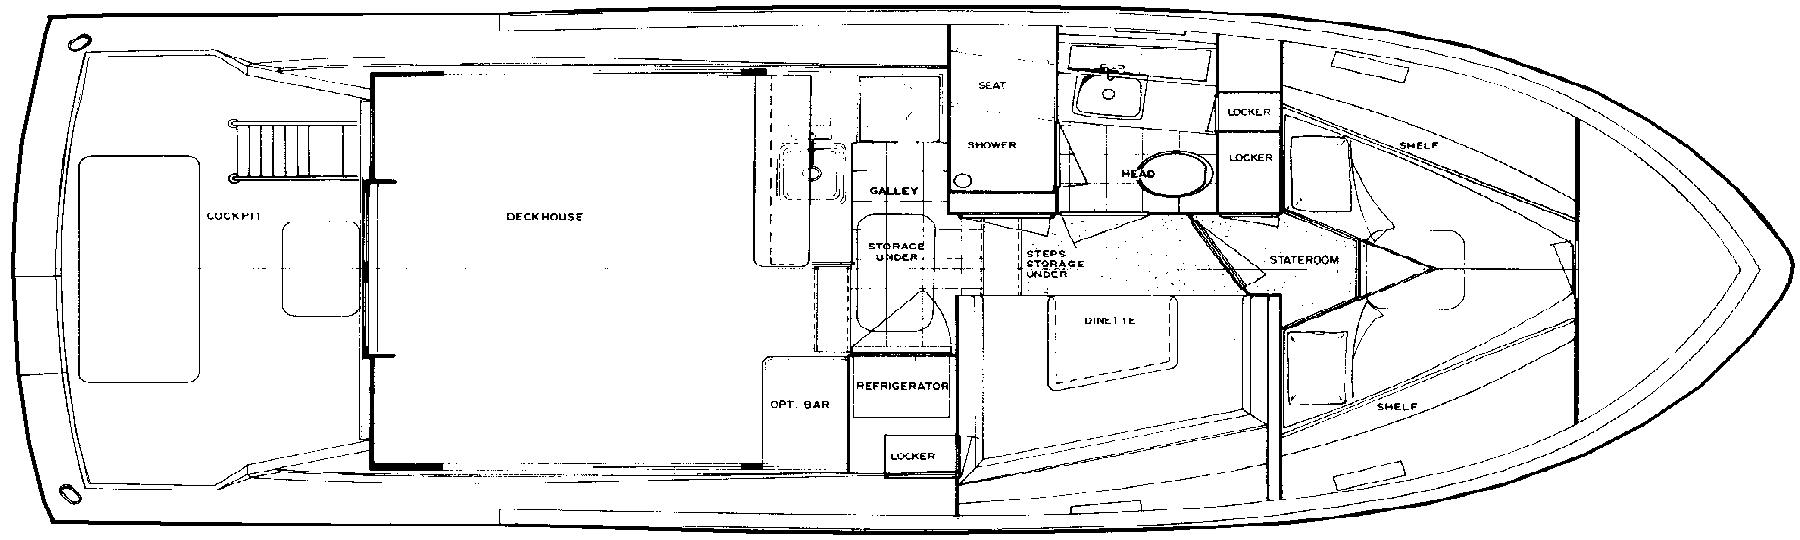 36 Sedan Floor Plan 2